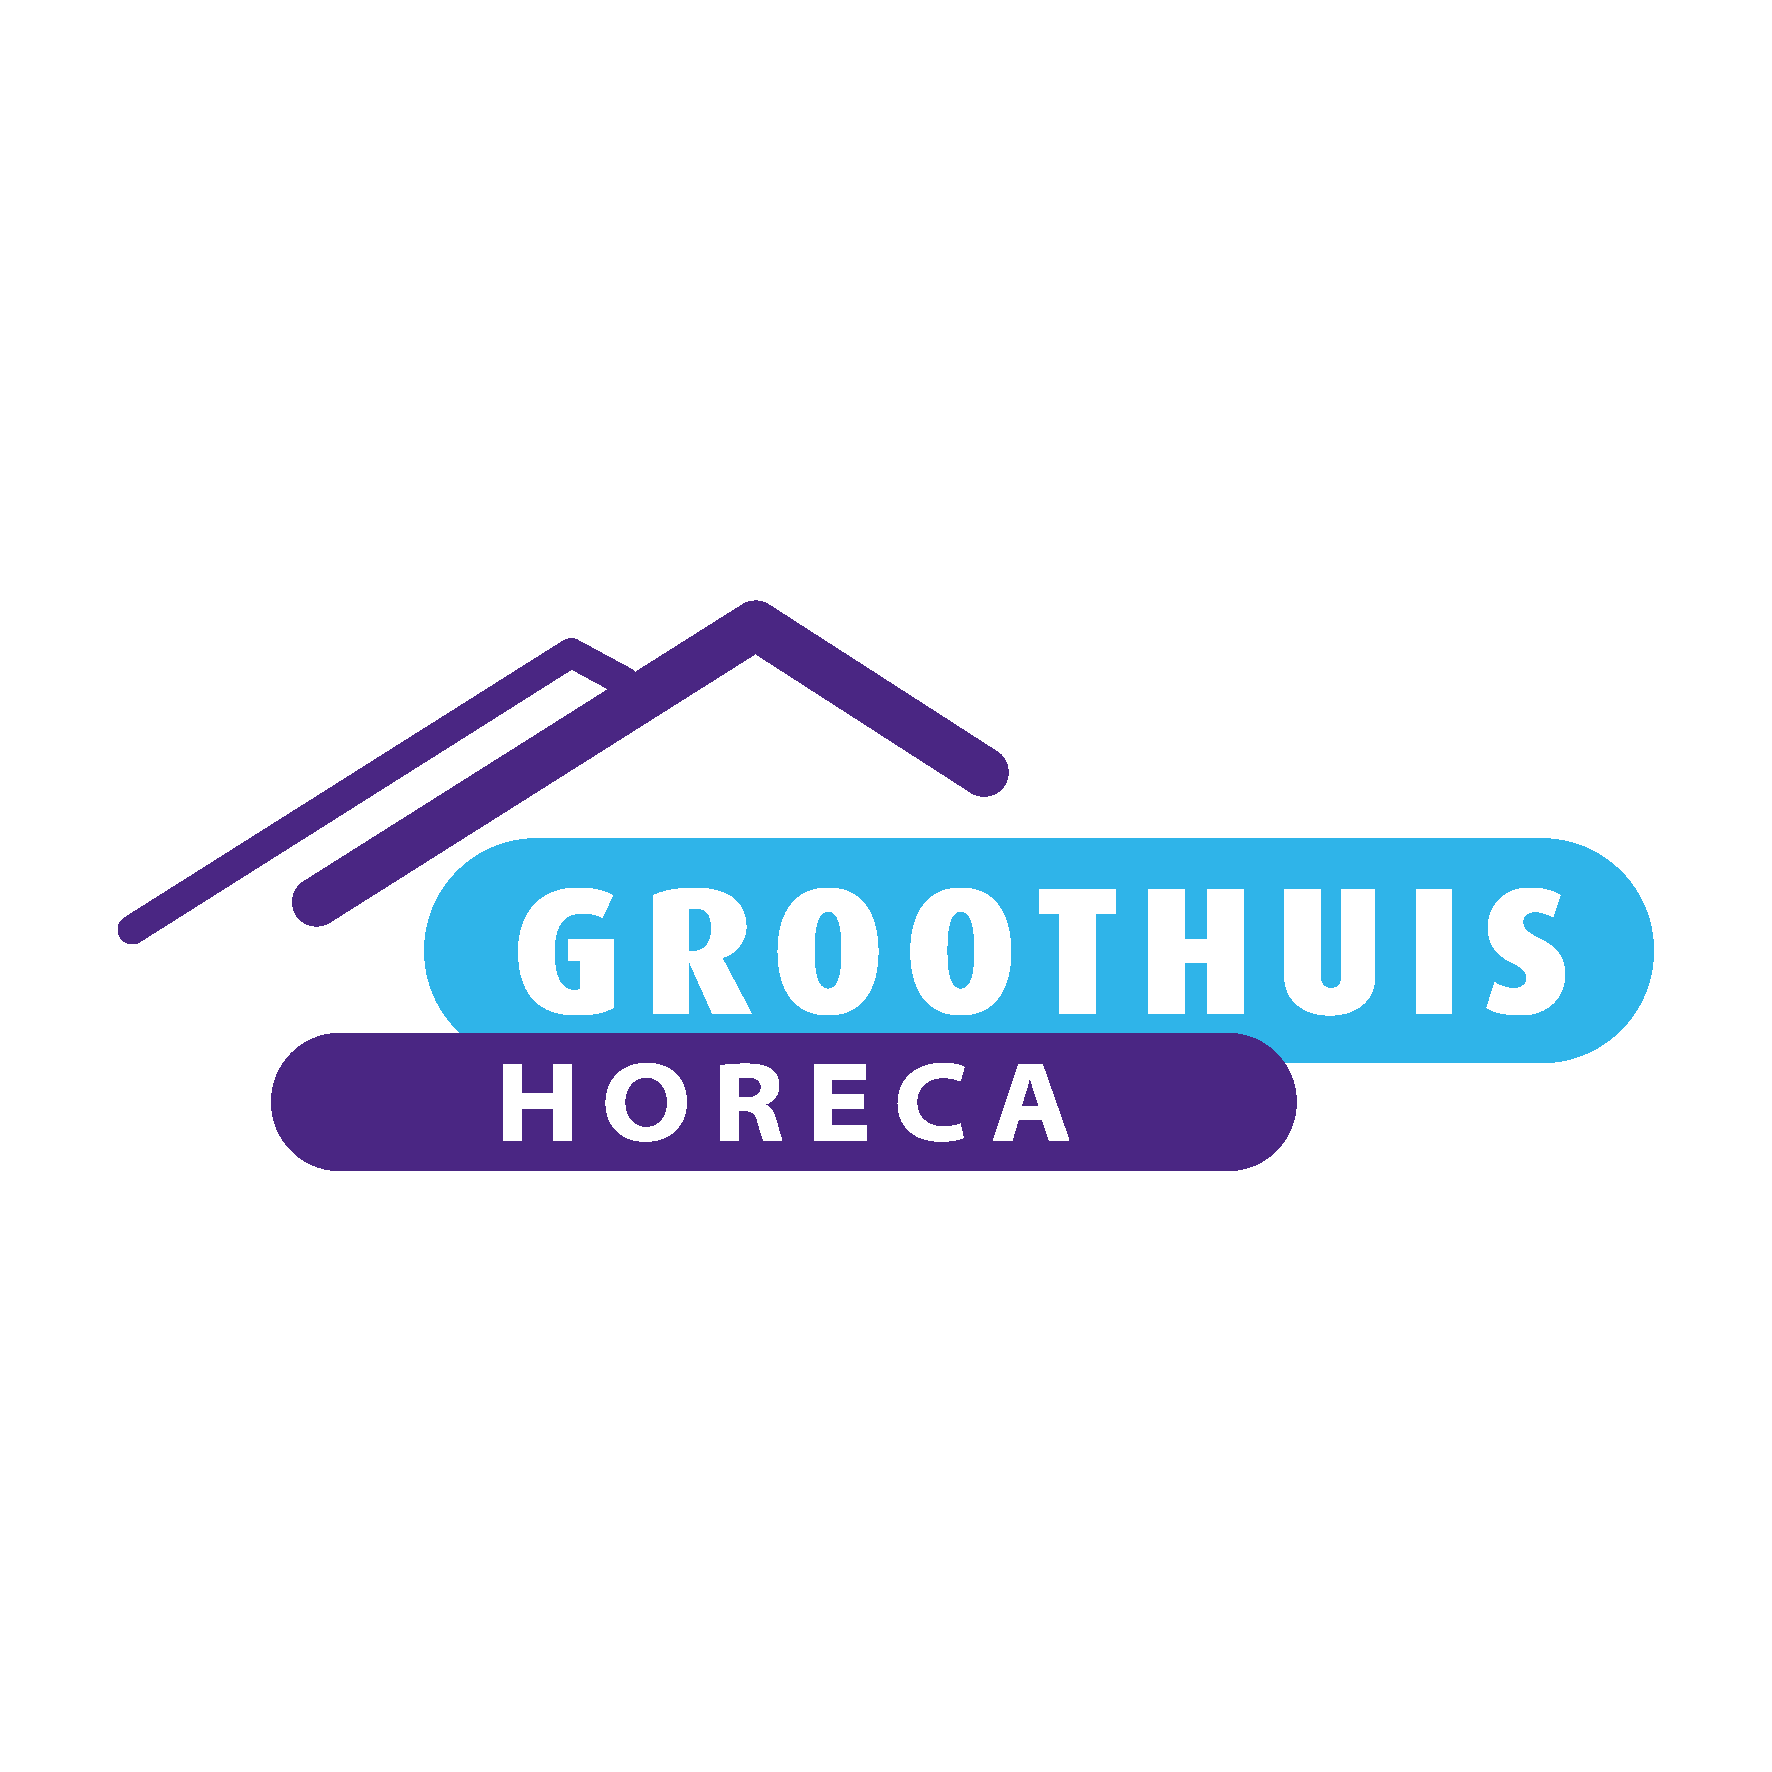 Groothuis Horeca